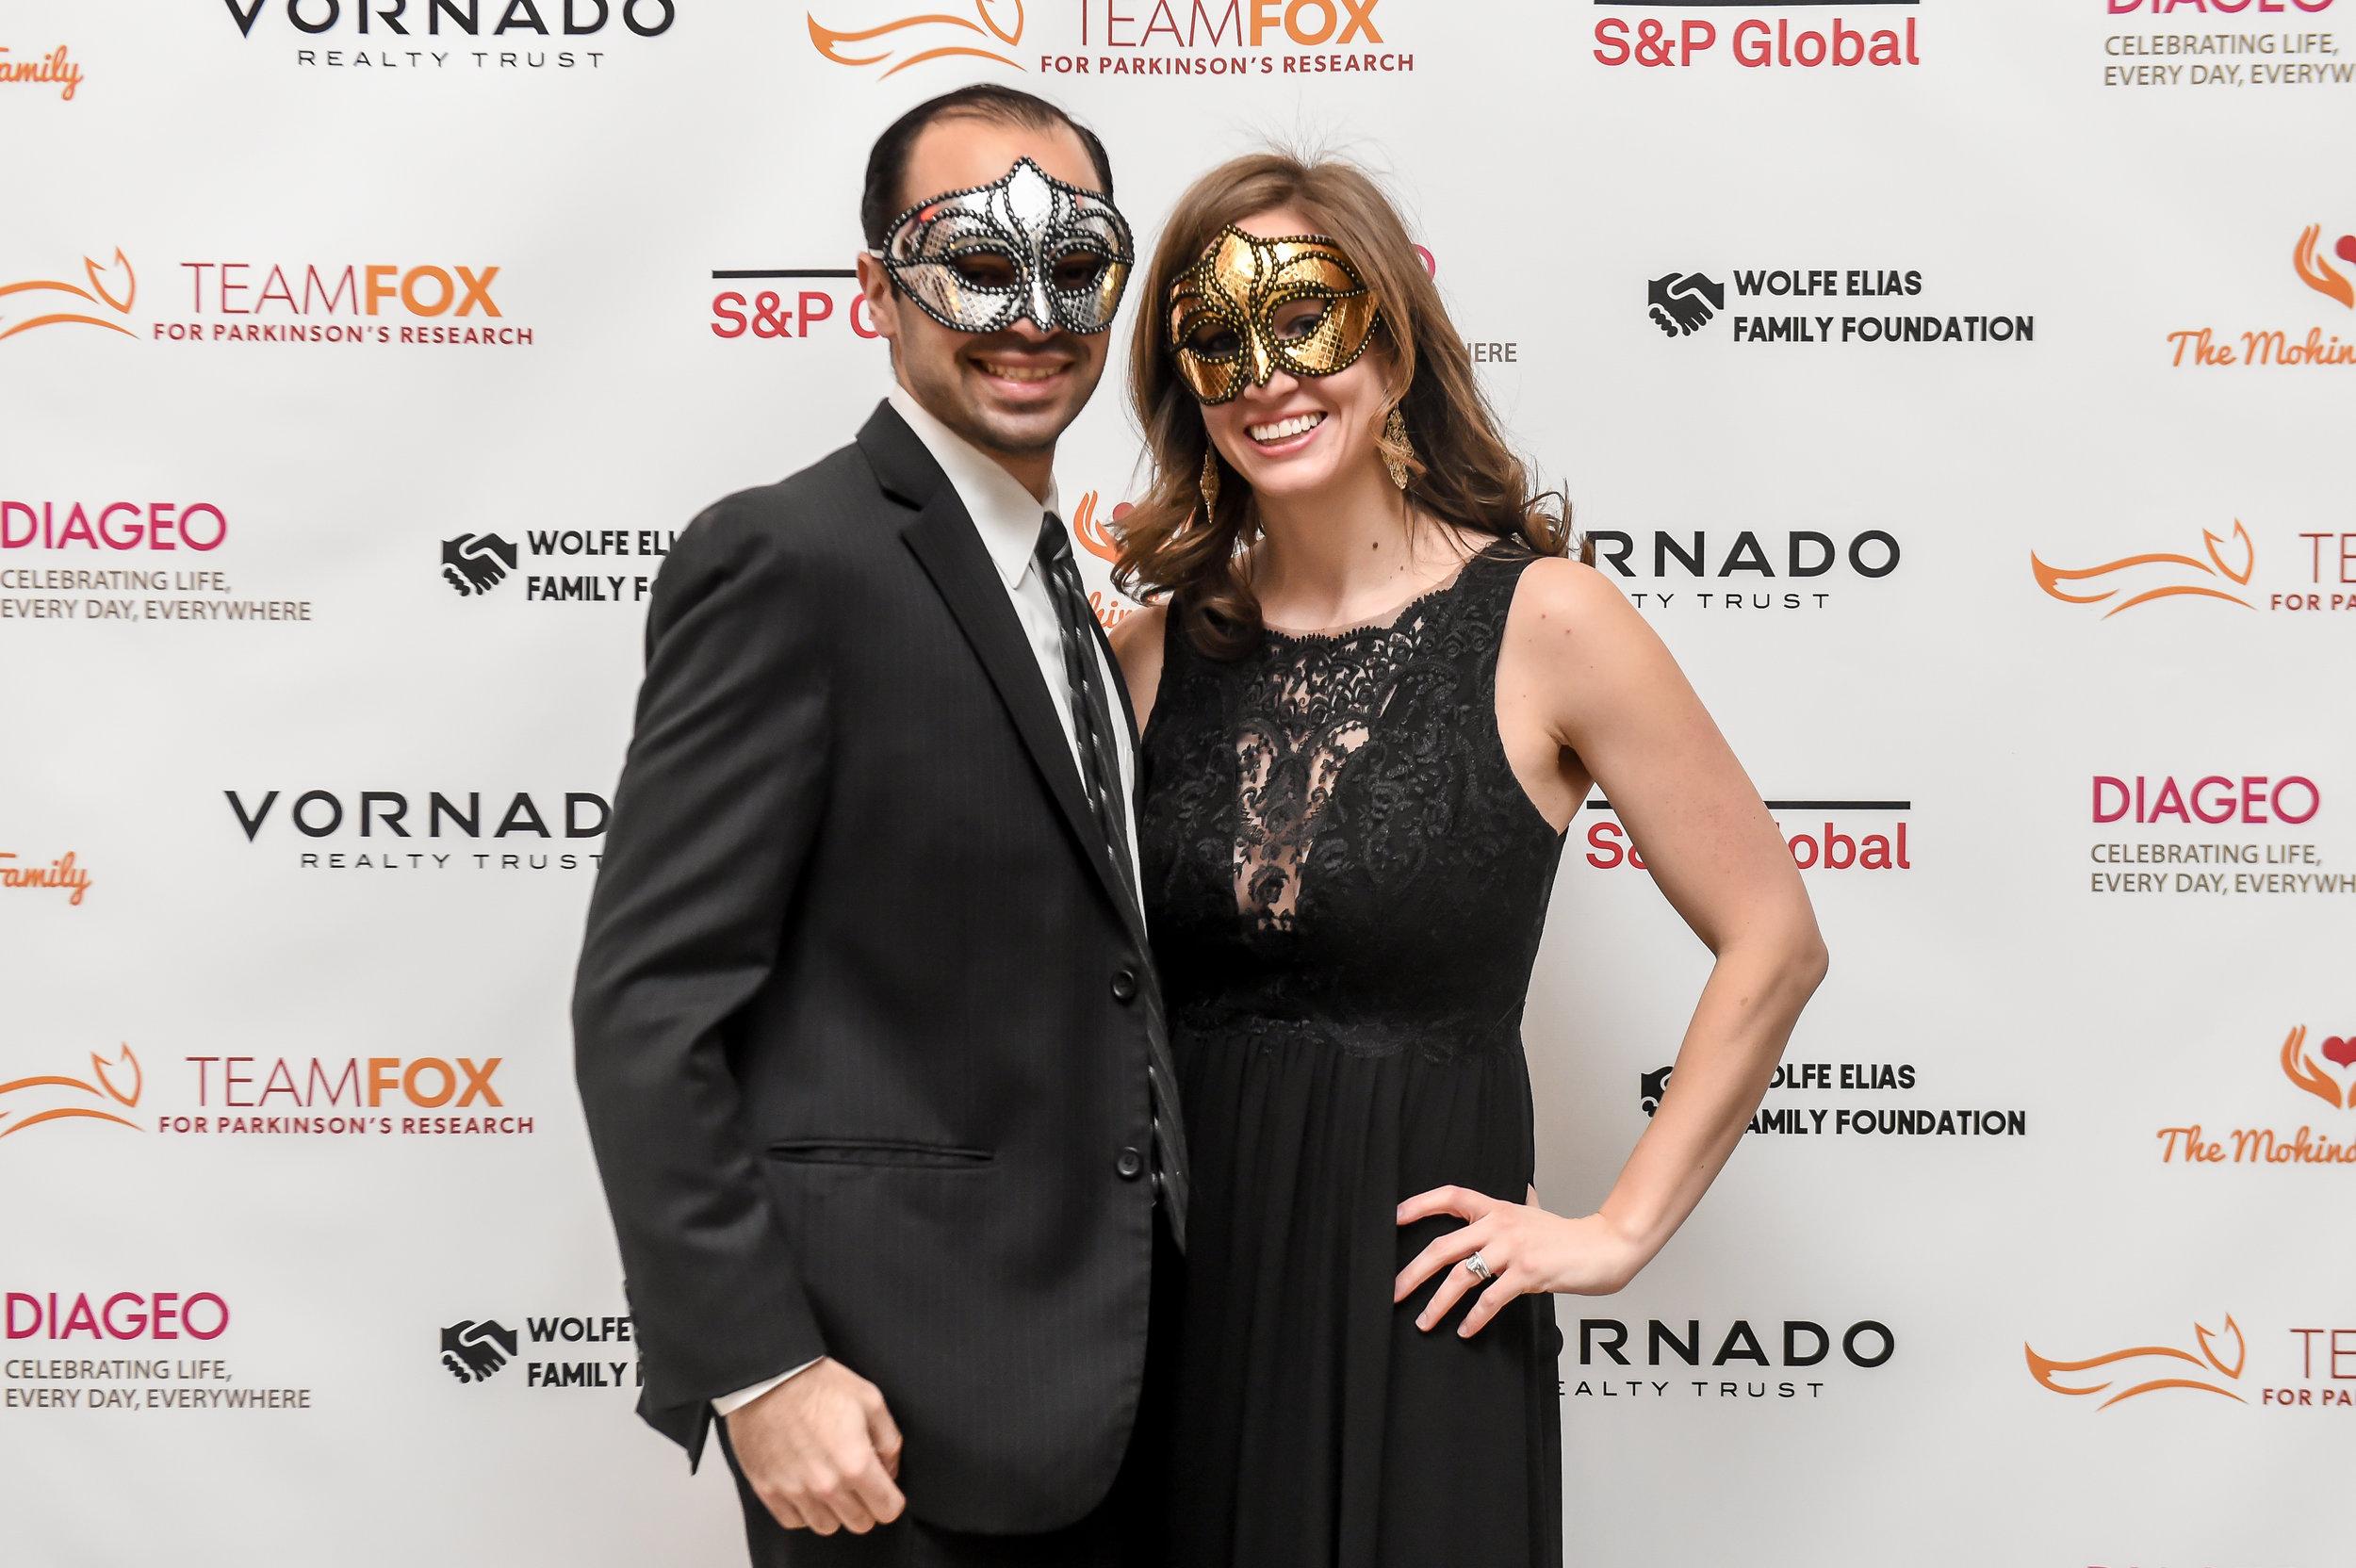 NY Gala - Michael J. Fox Foundation - 101.JPG